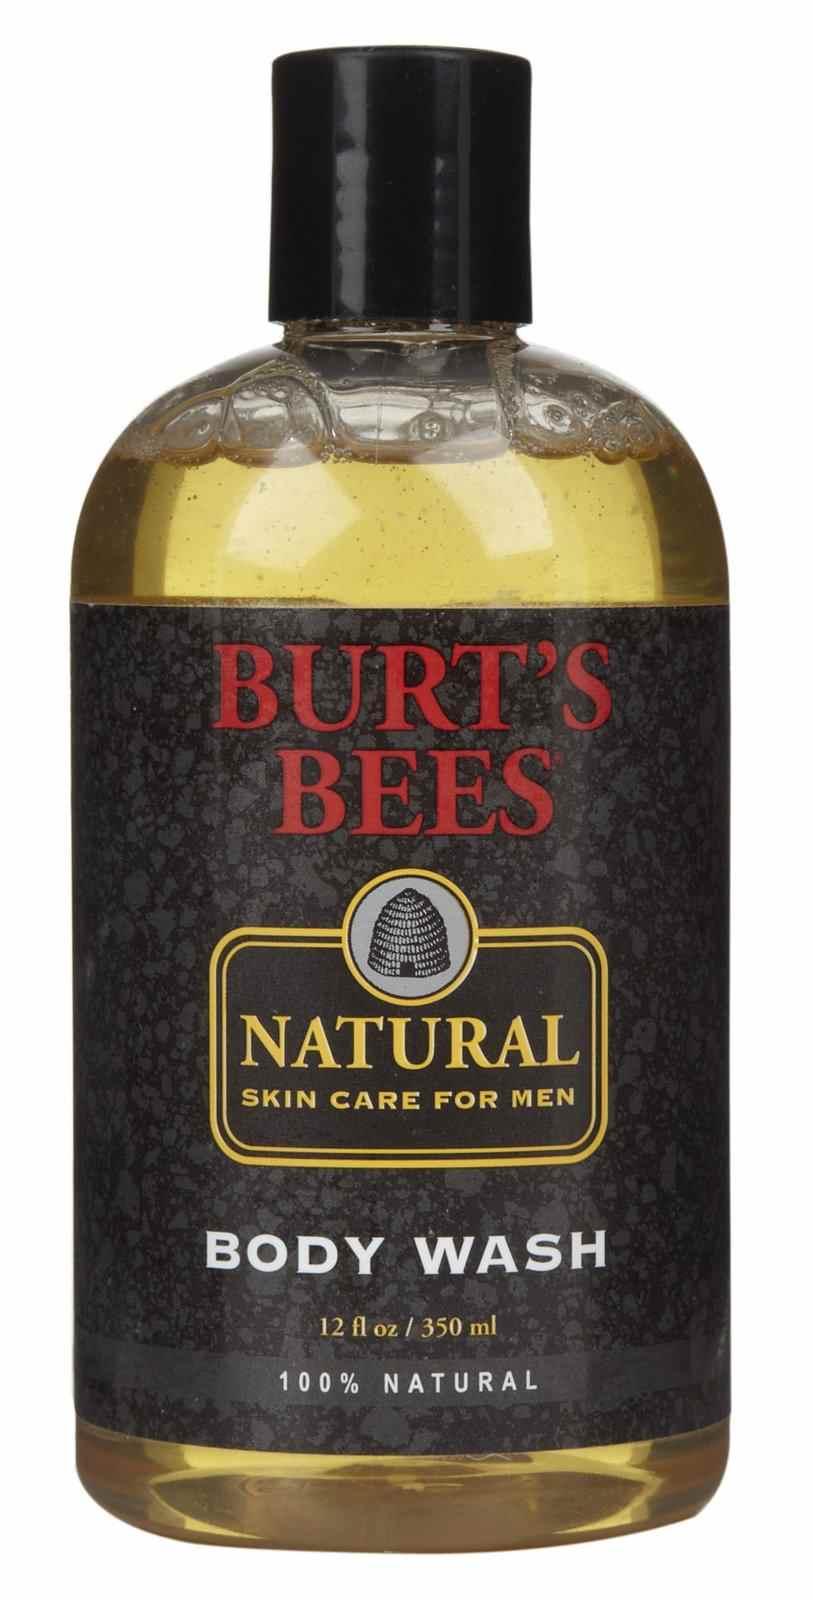 Burt's Bees Natural Skin Care for Men Body Wash